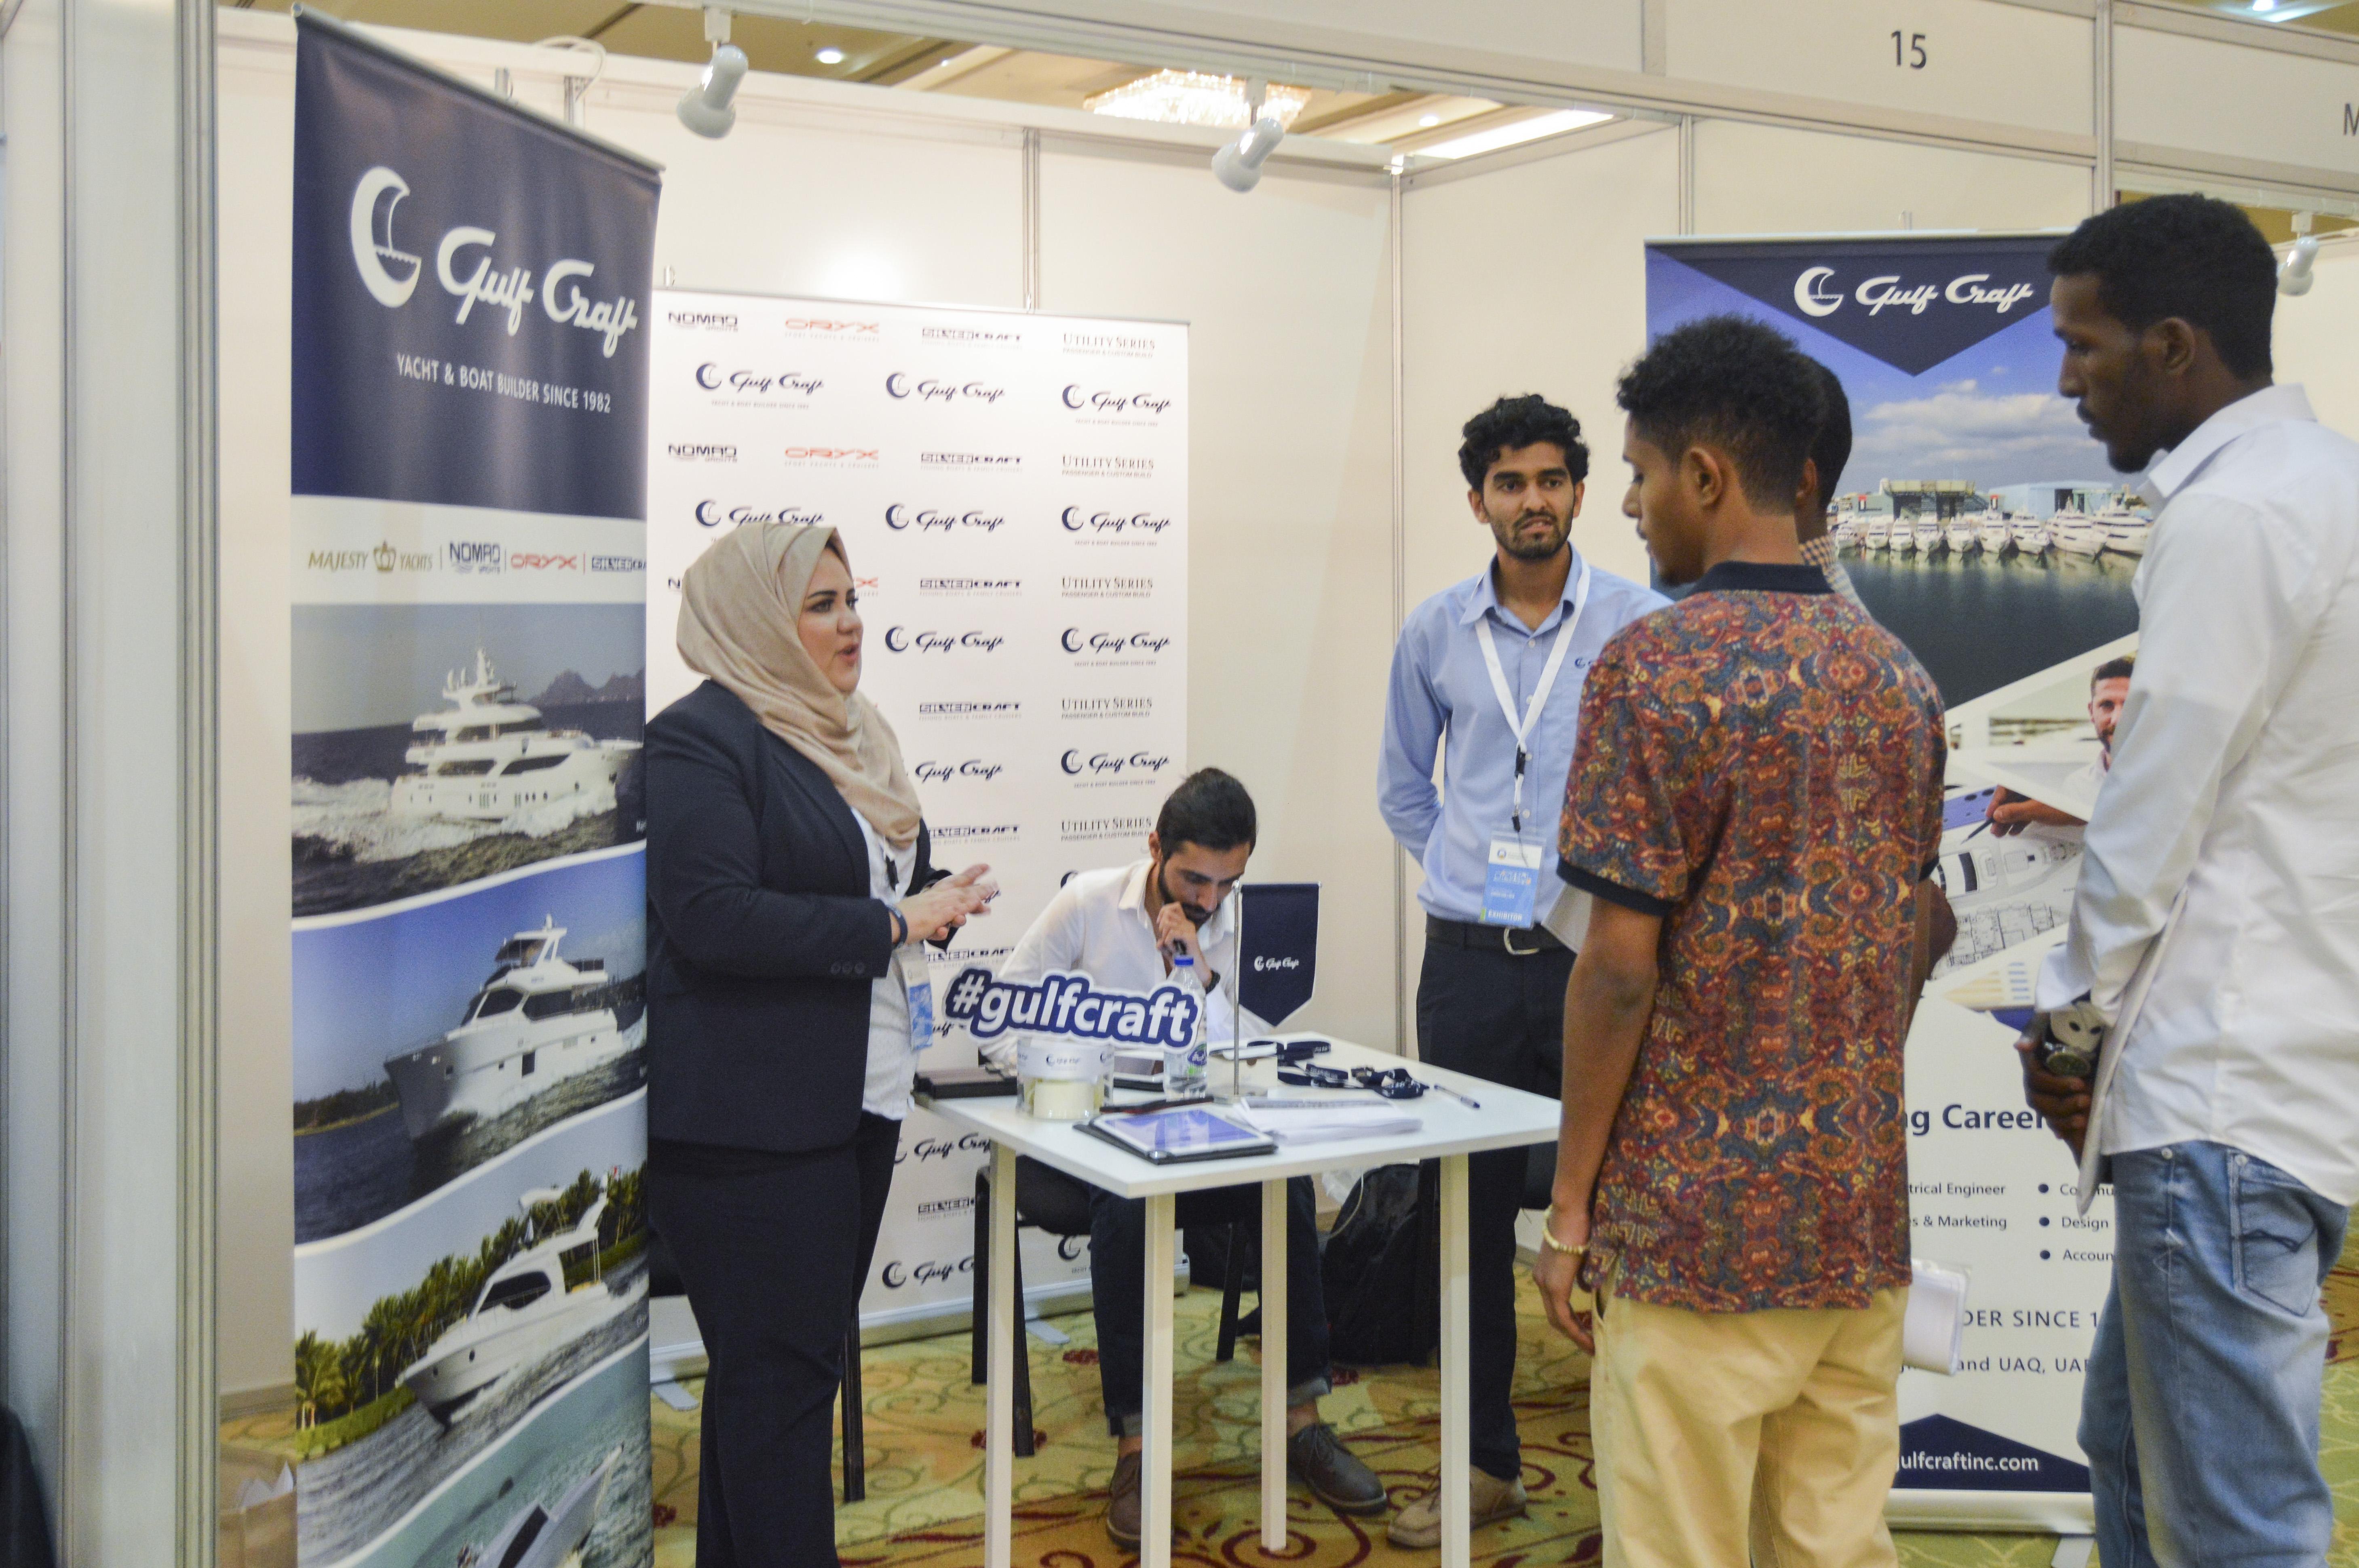 Gulf Craft at Ajman University Job Fair 2018 (24).jpg